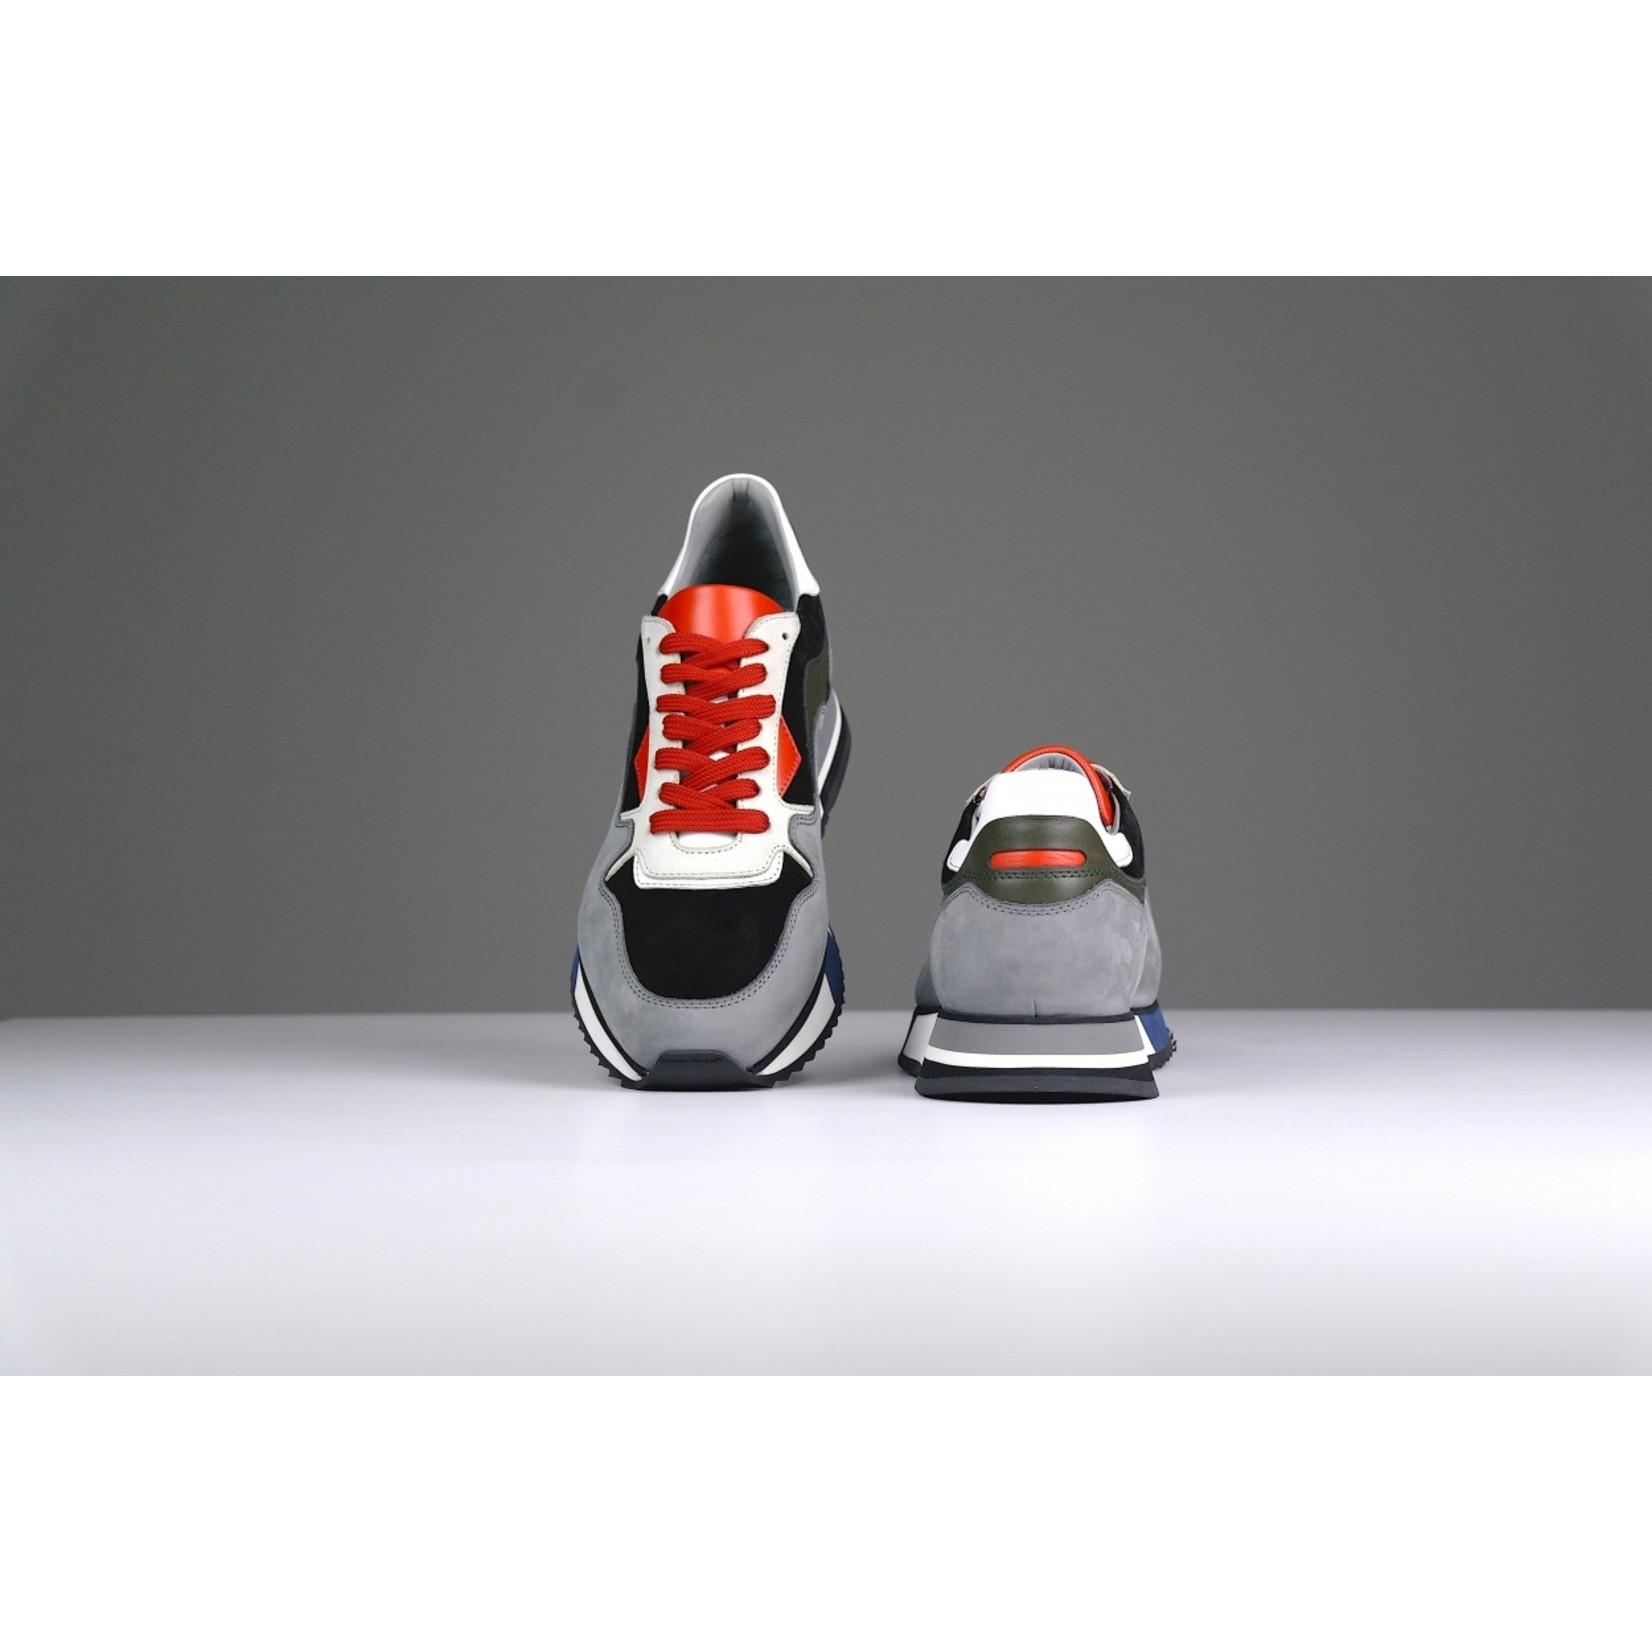 H32 Mello sneaker grijs zwart wit